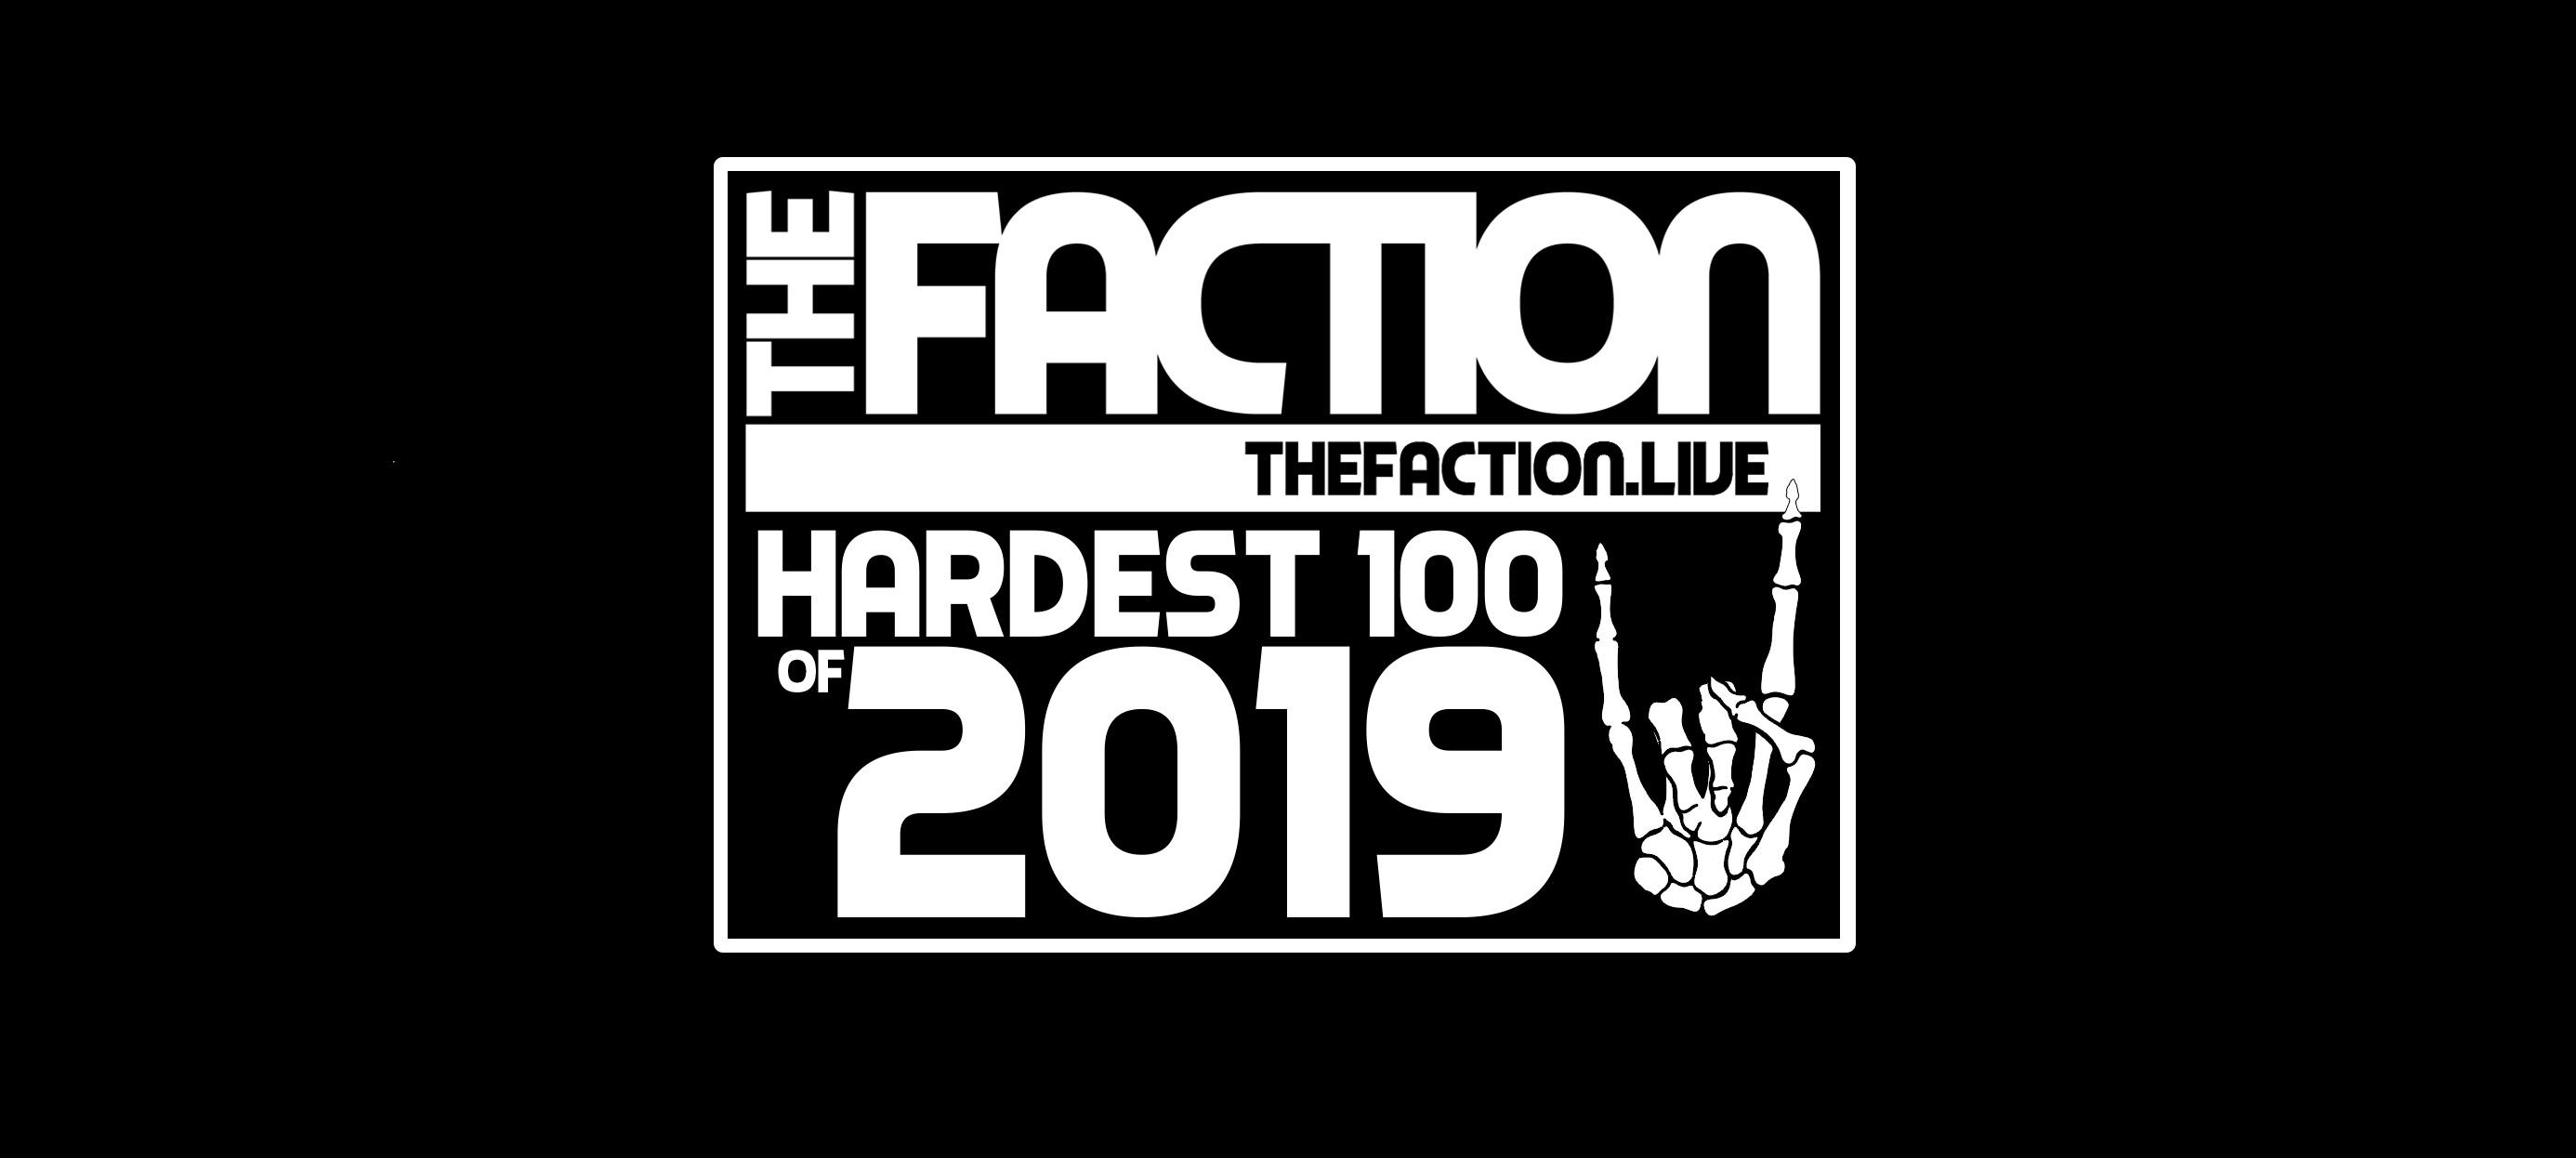 hardest 100 2019 coming soon